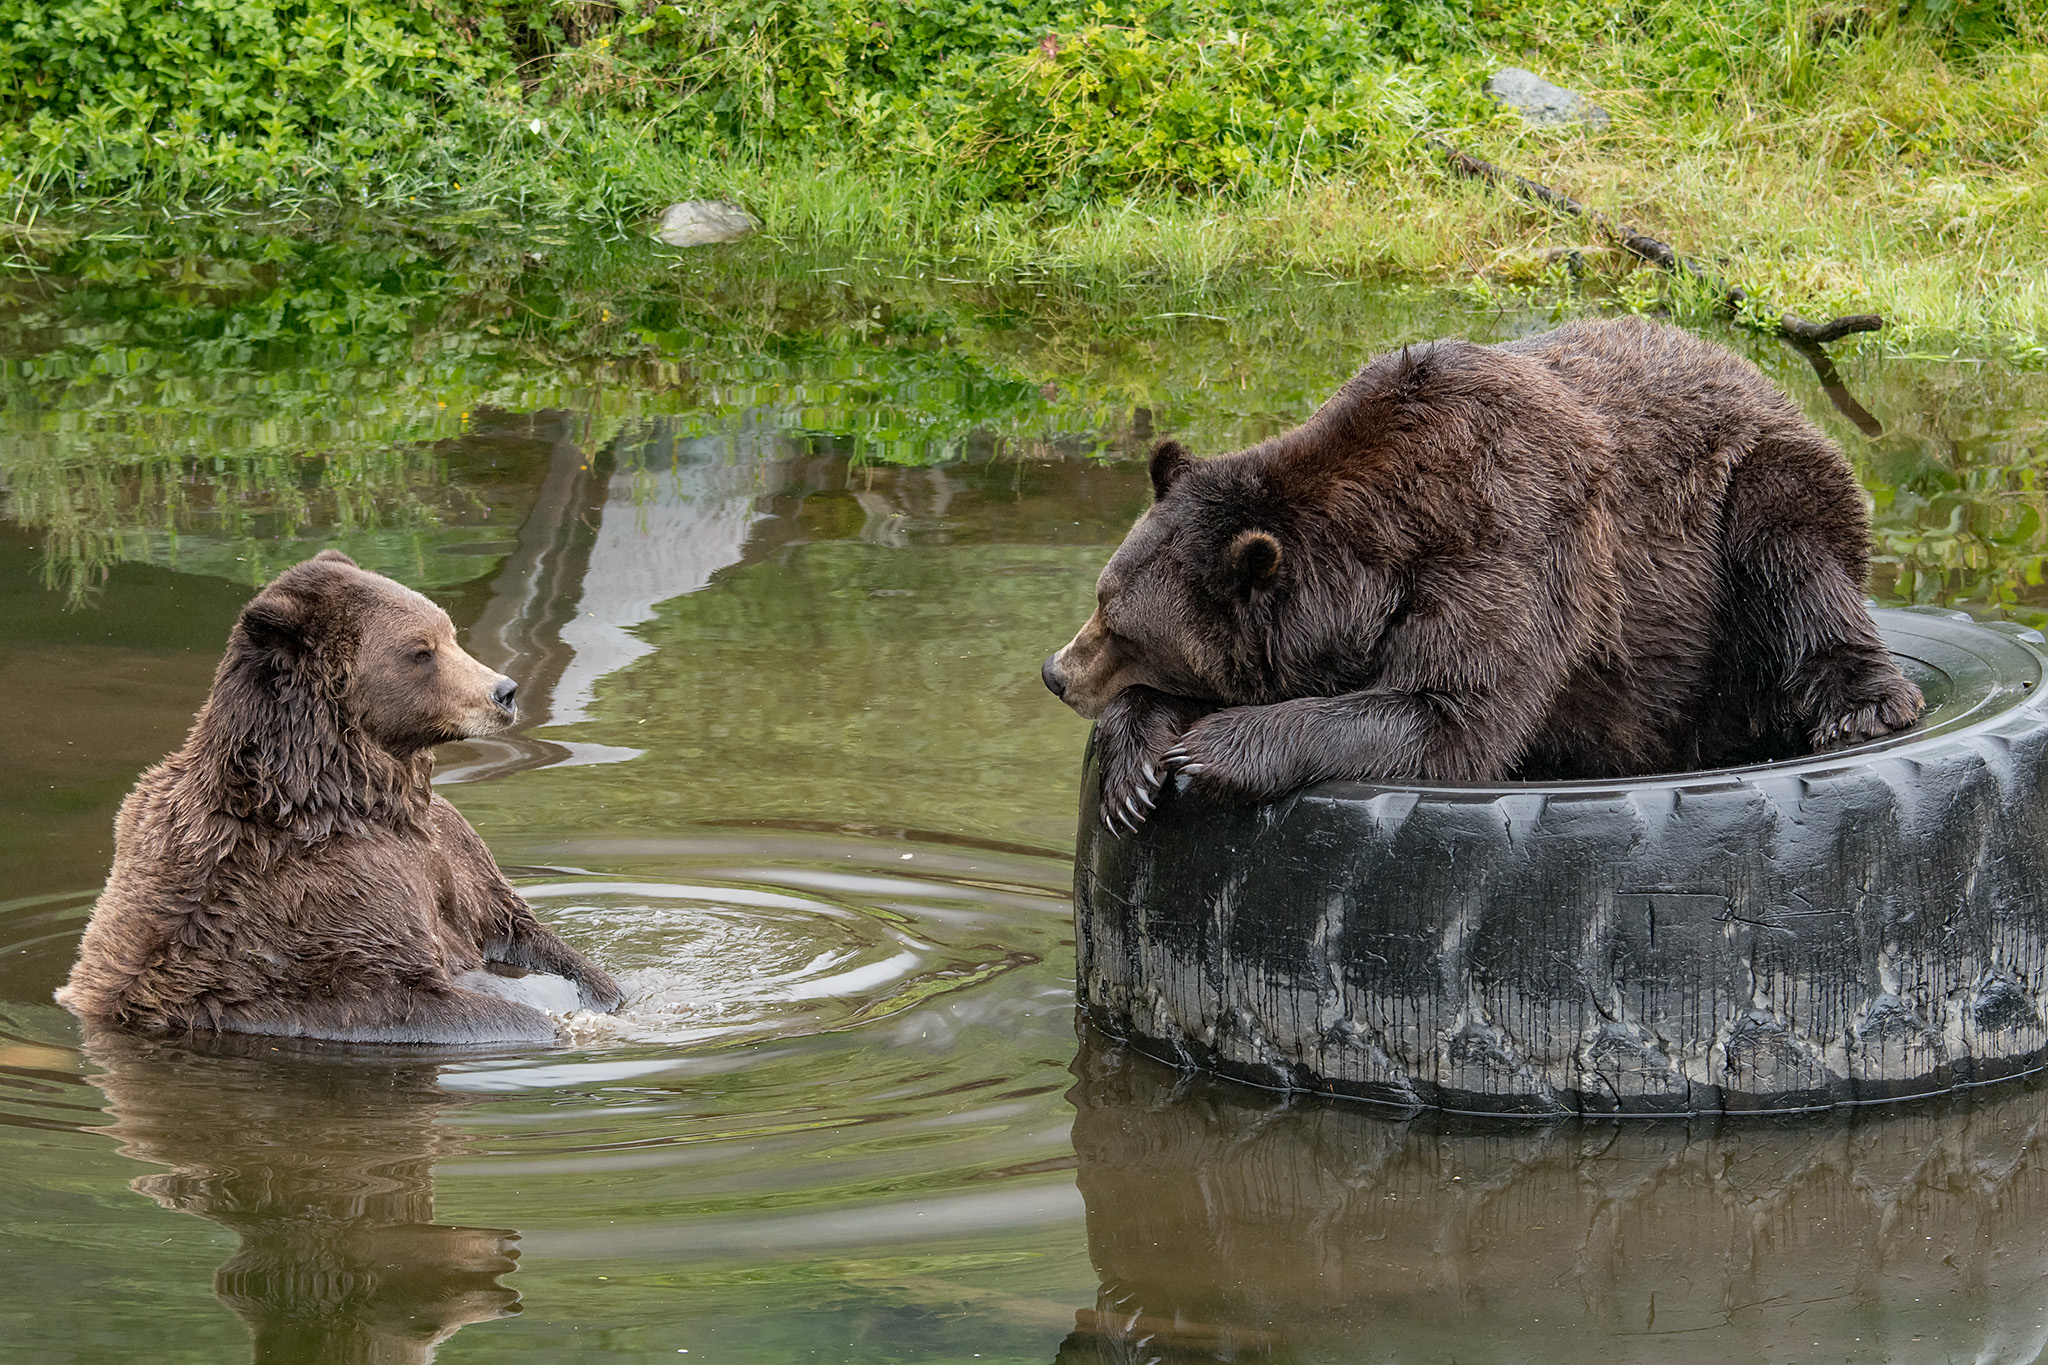 20180812 - Sitka Raptor Center & Fortress of the Bear - 194.jpg